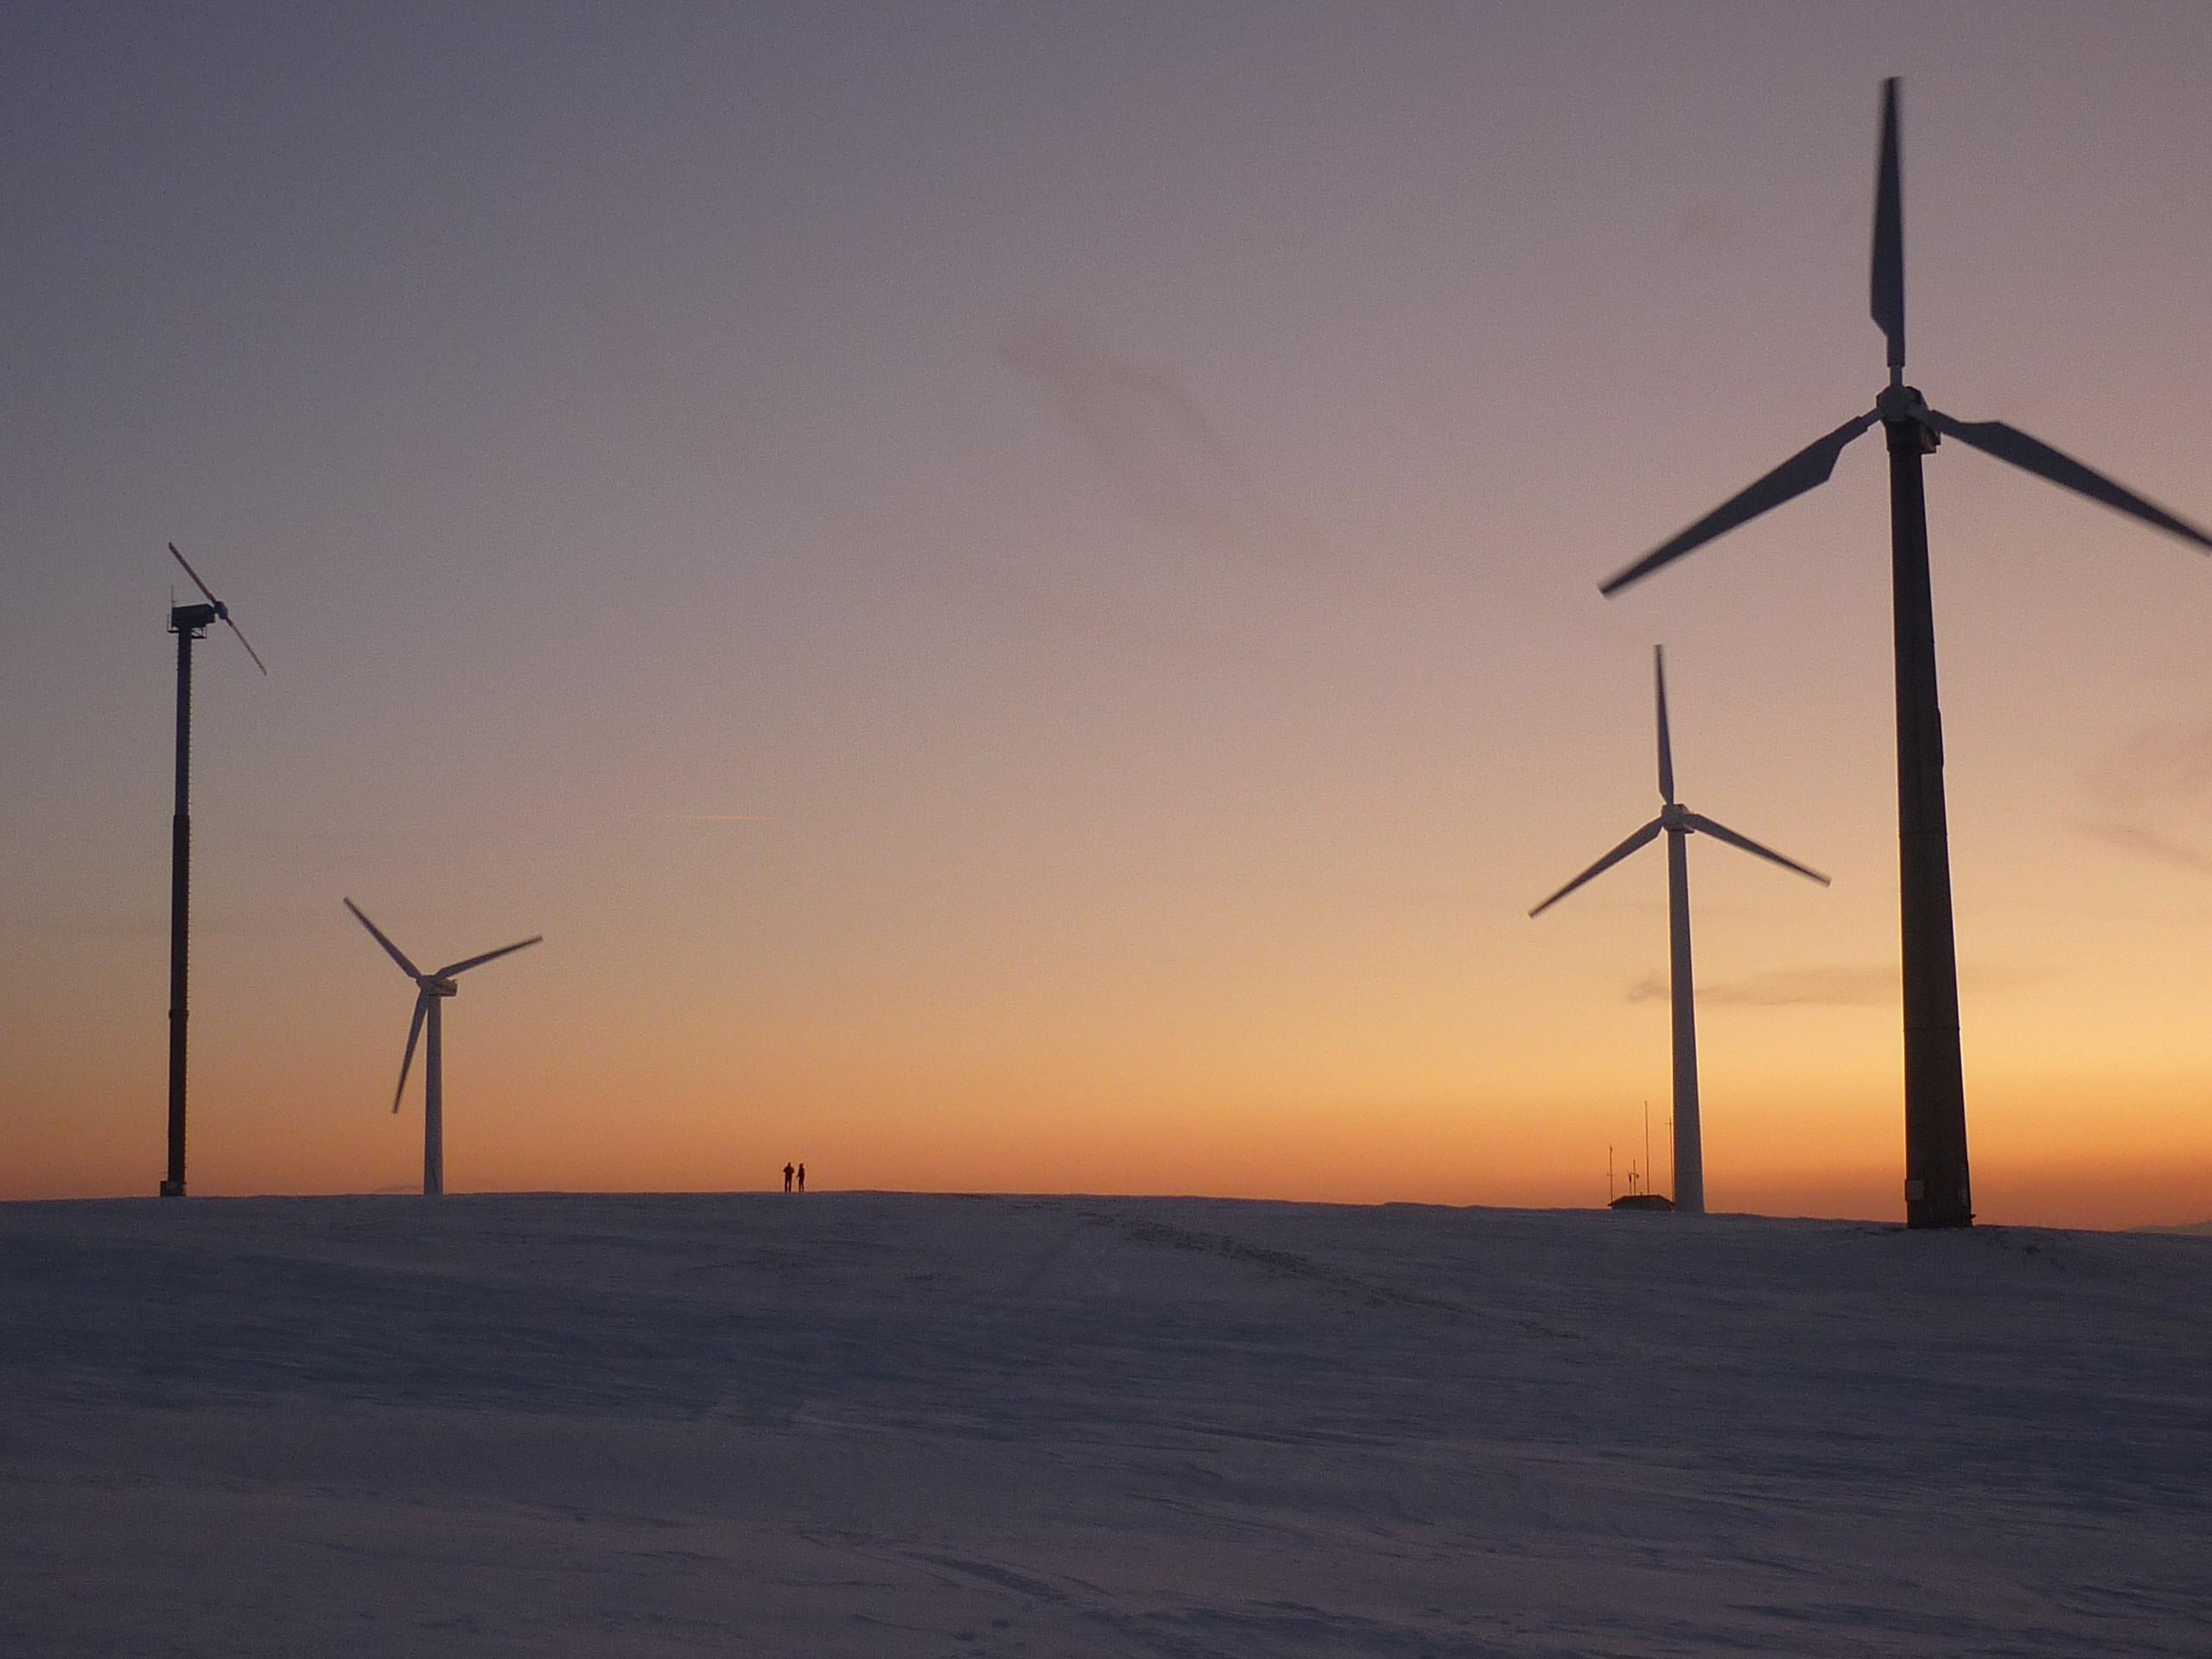 Sonnenuntergang am Hirtstein bei Satzung